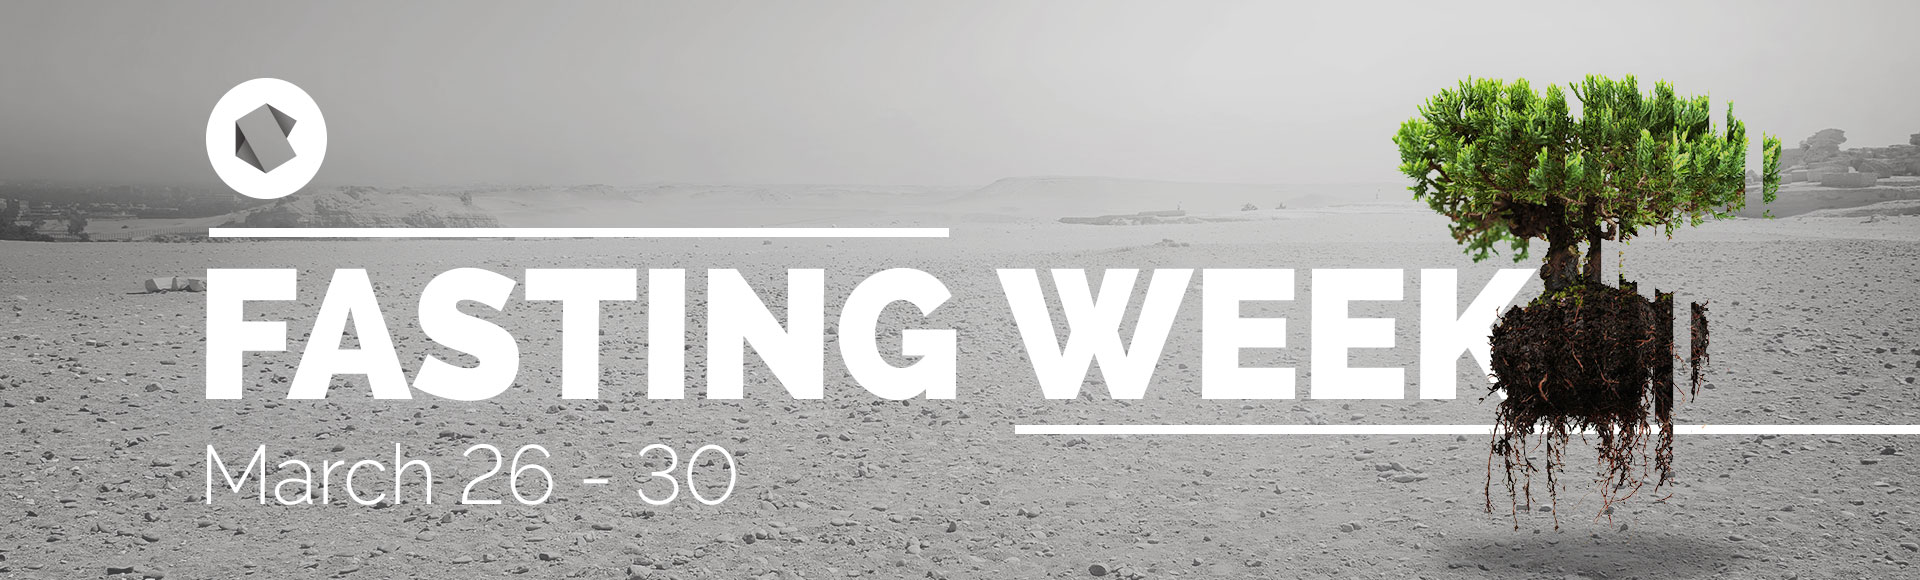 Fasting_week_2018-Web-1920x580